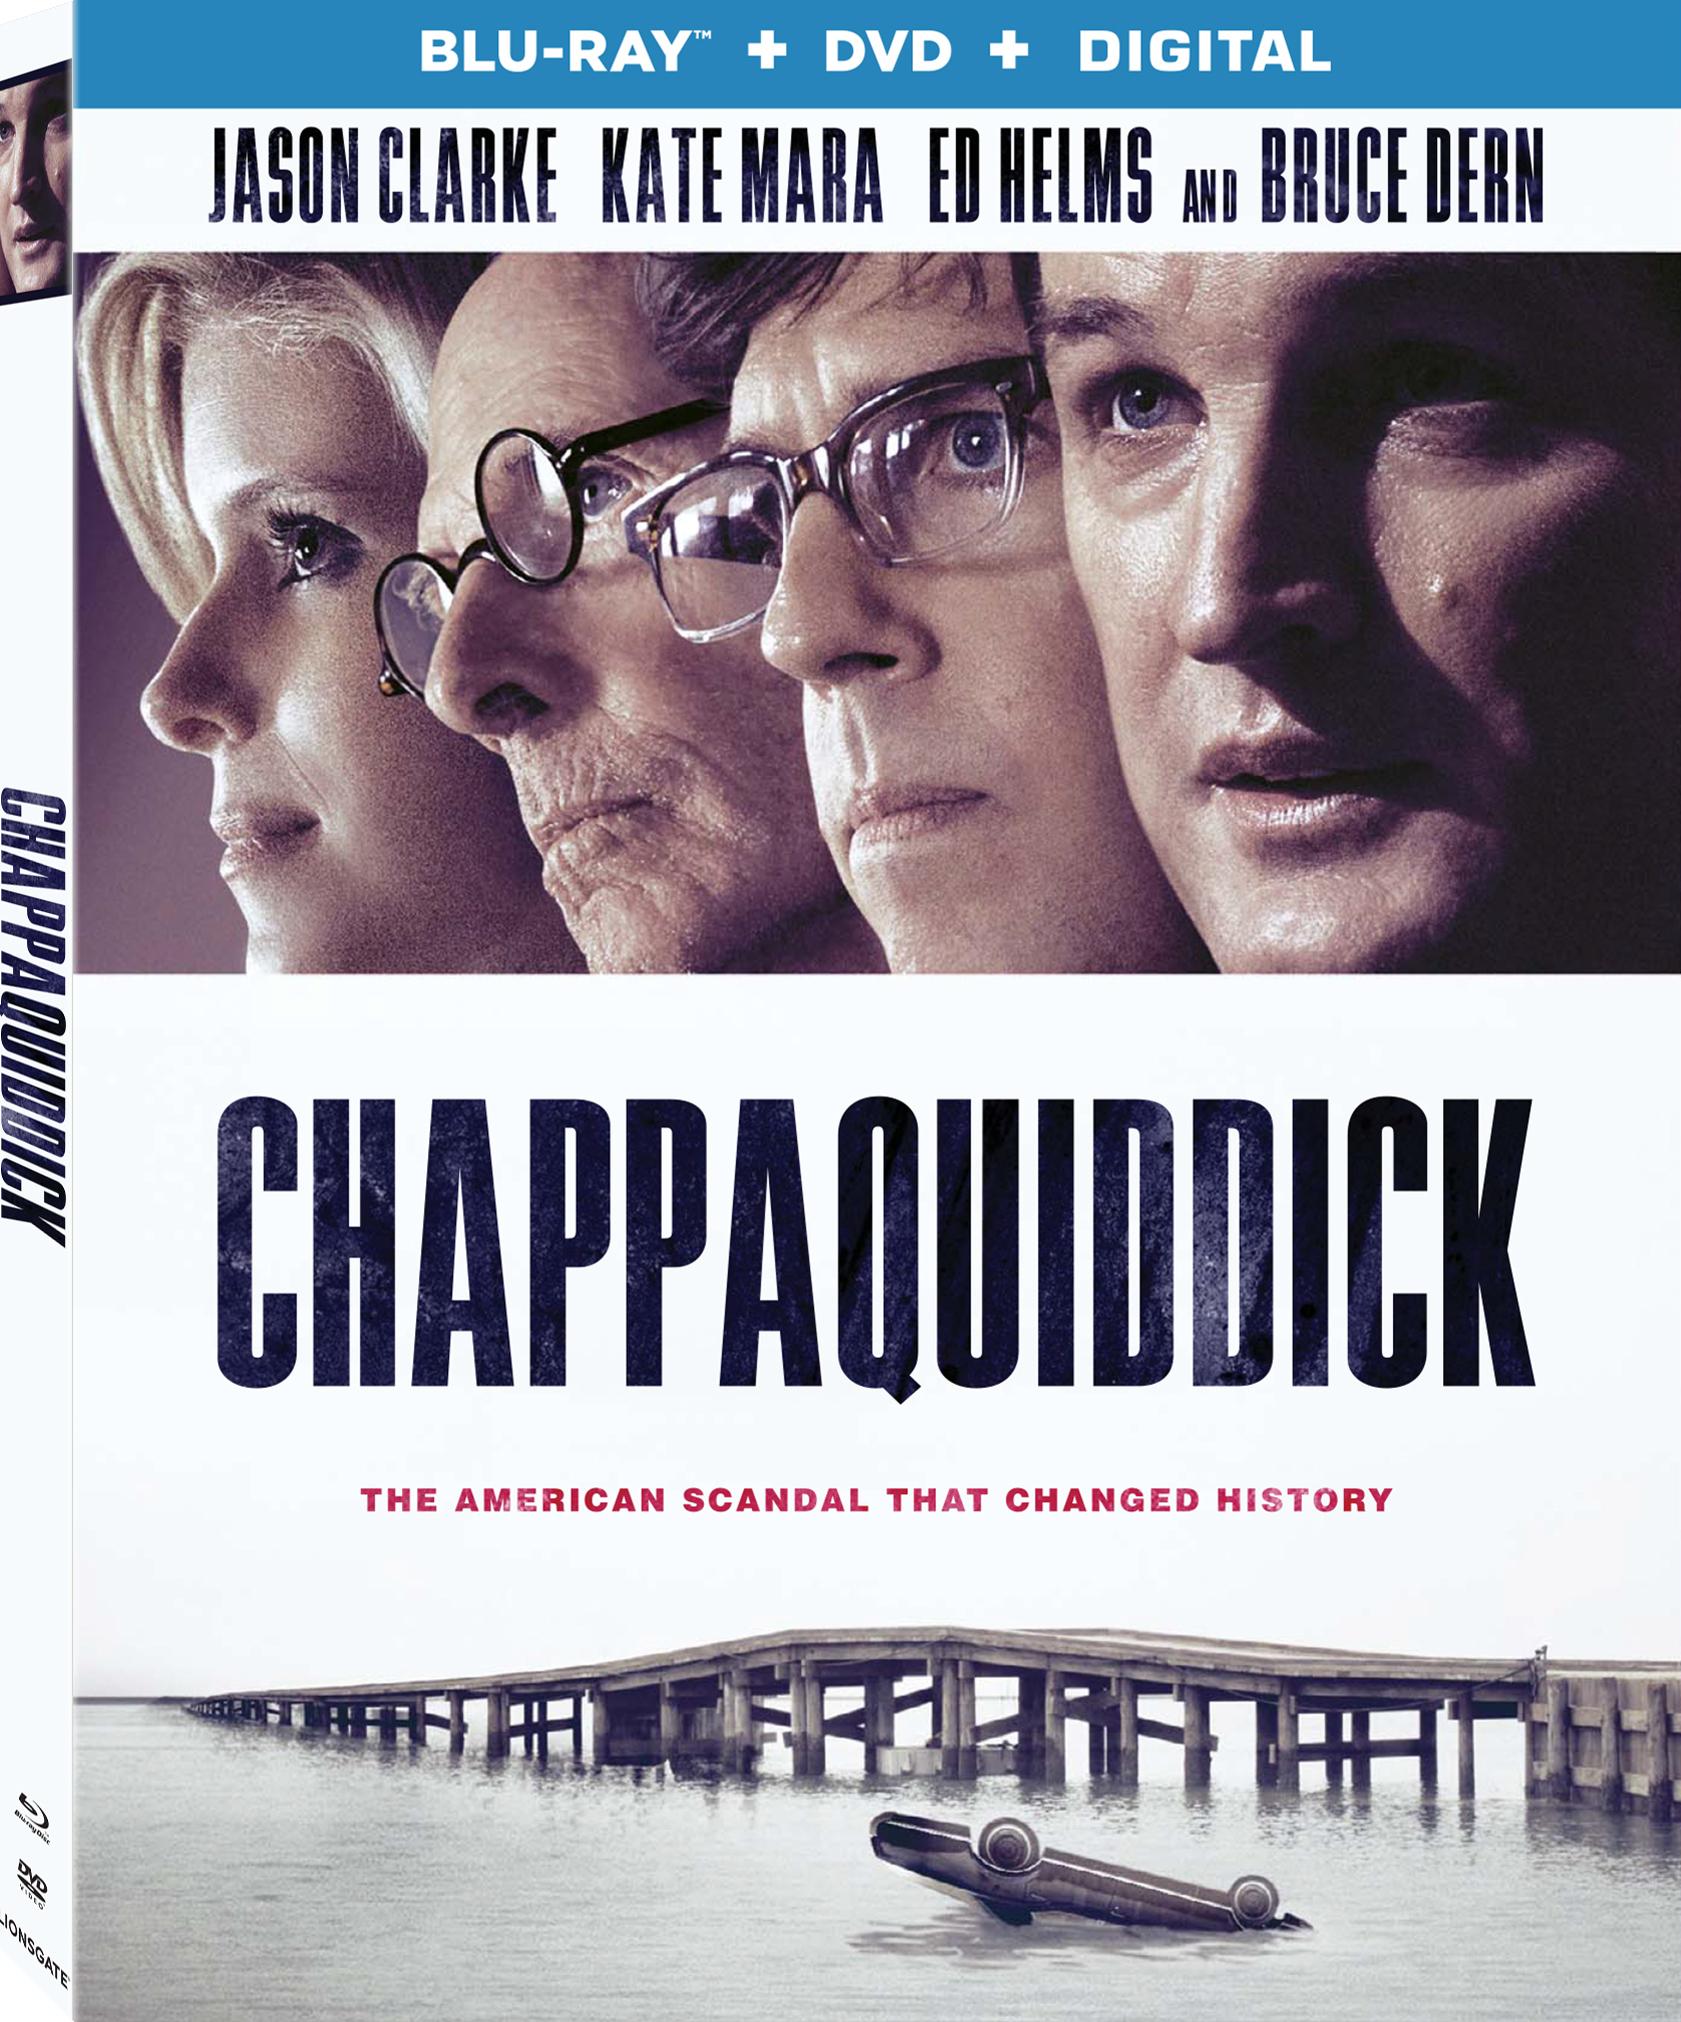 Chappaquiddick (2017) Blu-ray